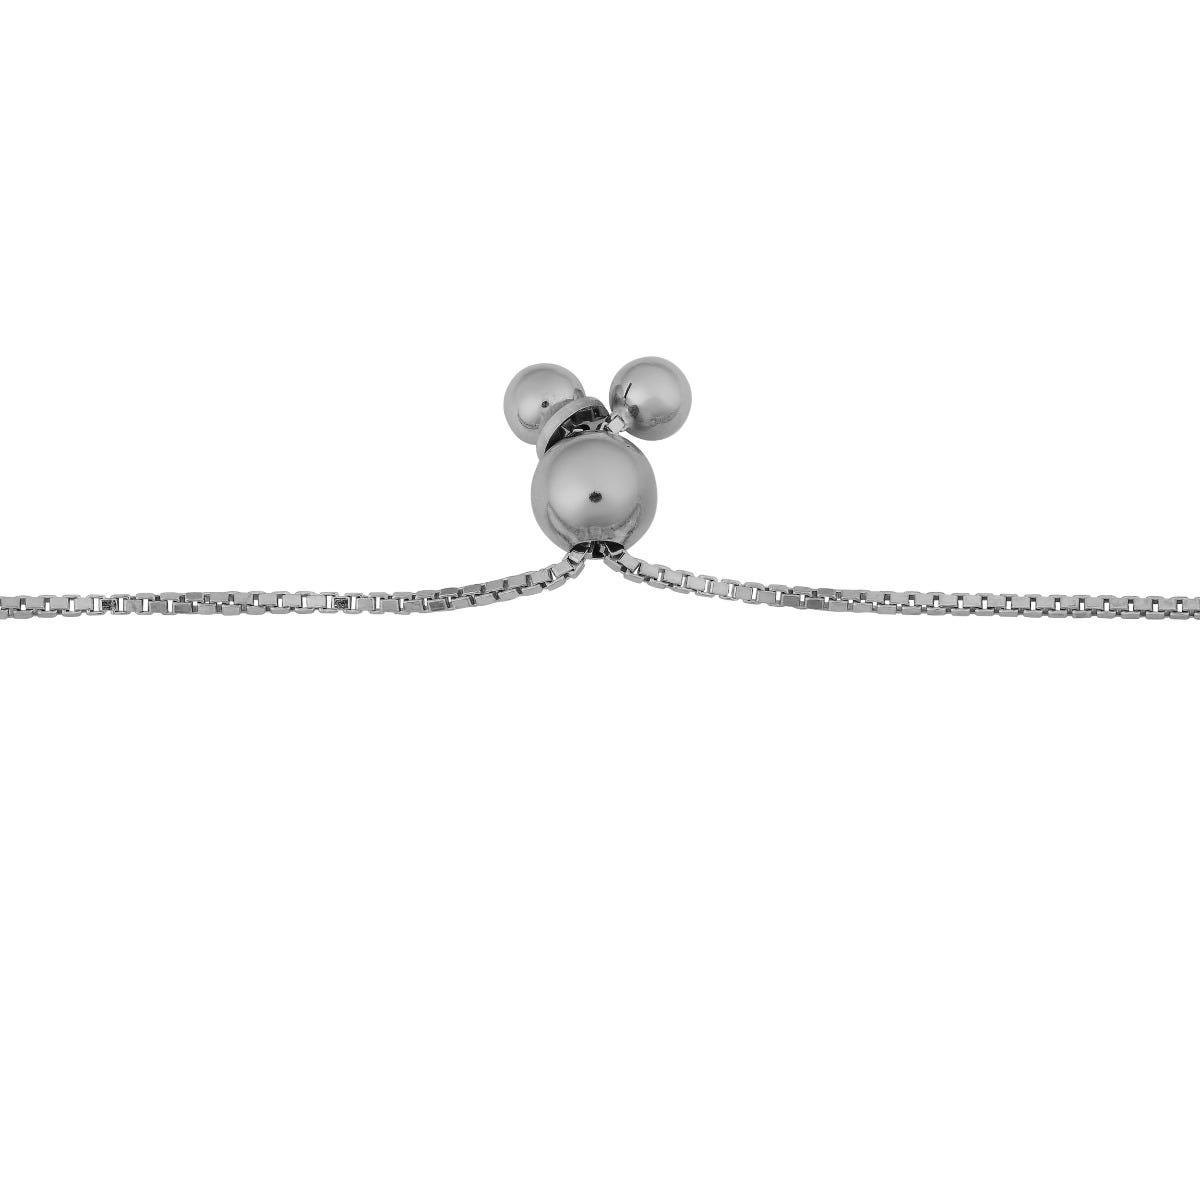 Adjustable Bolo Graduated Bead Bracelet in Sterling Silver